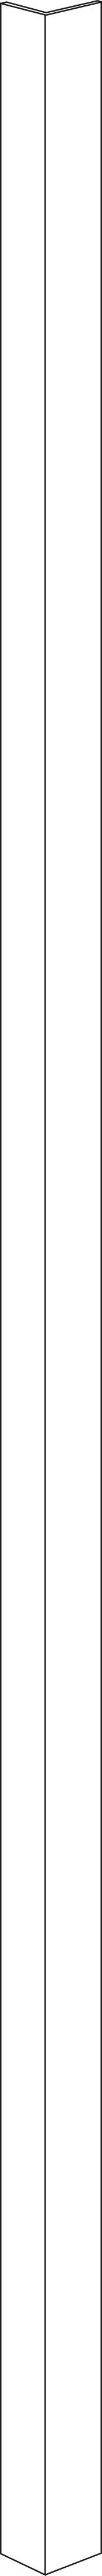 BREDDNINGSLIST KF 2166